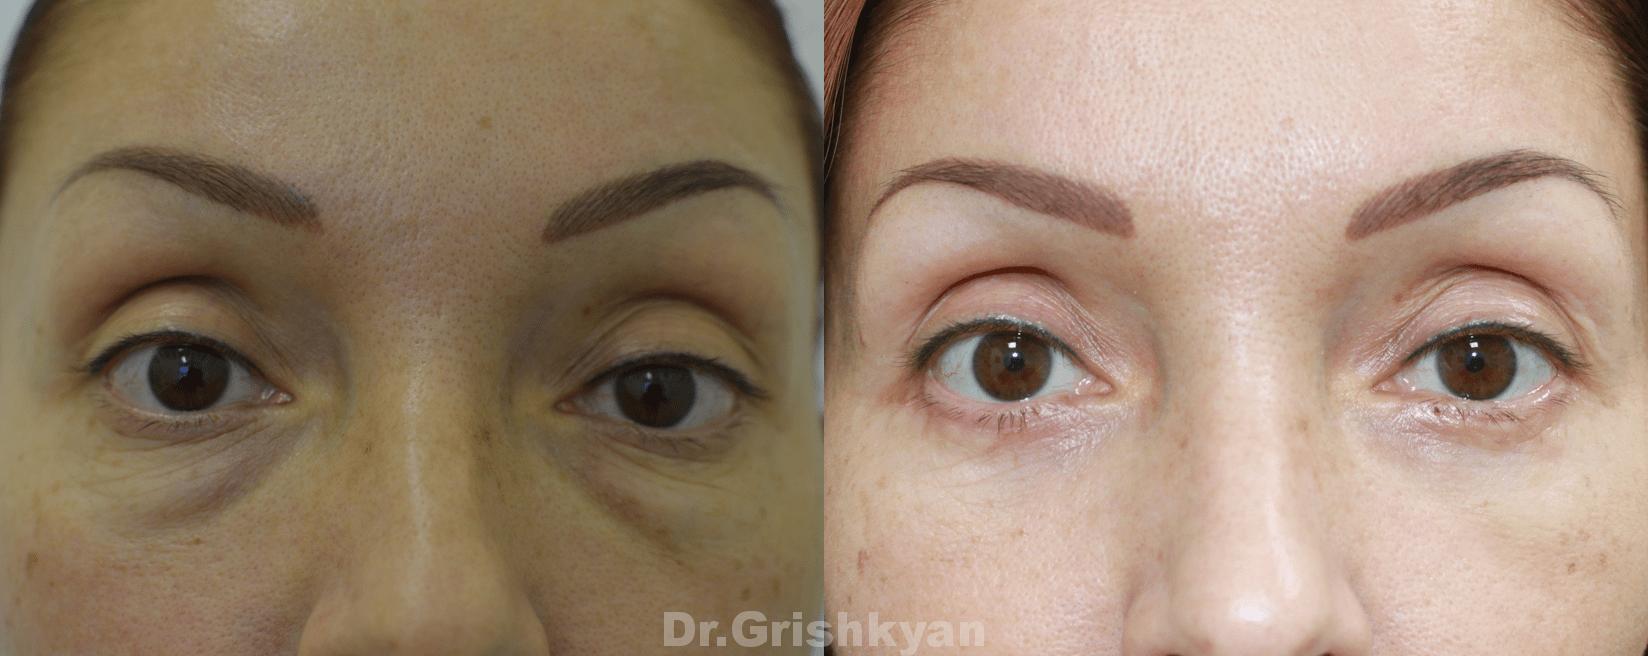 Фото Трансконъюктивальная нижняя блефаропластика фото до и после операции